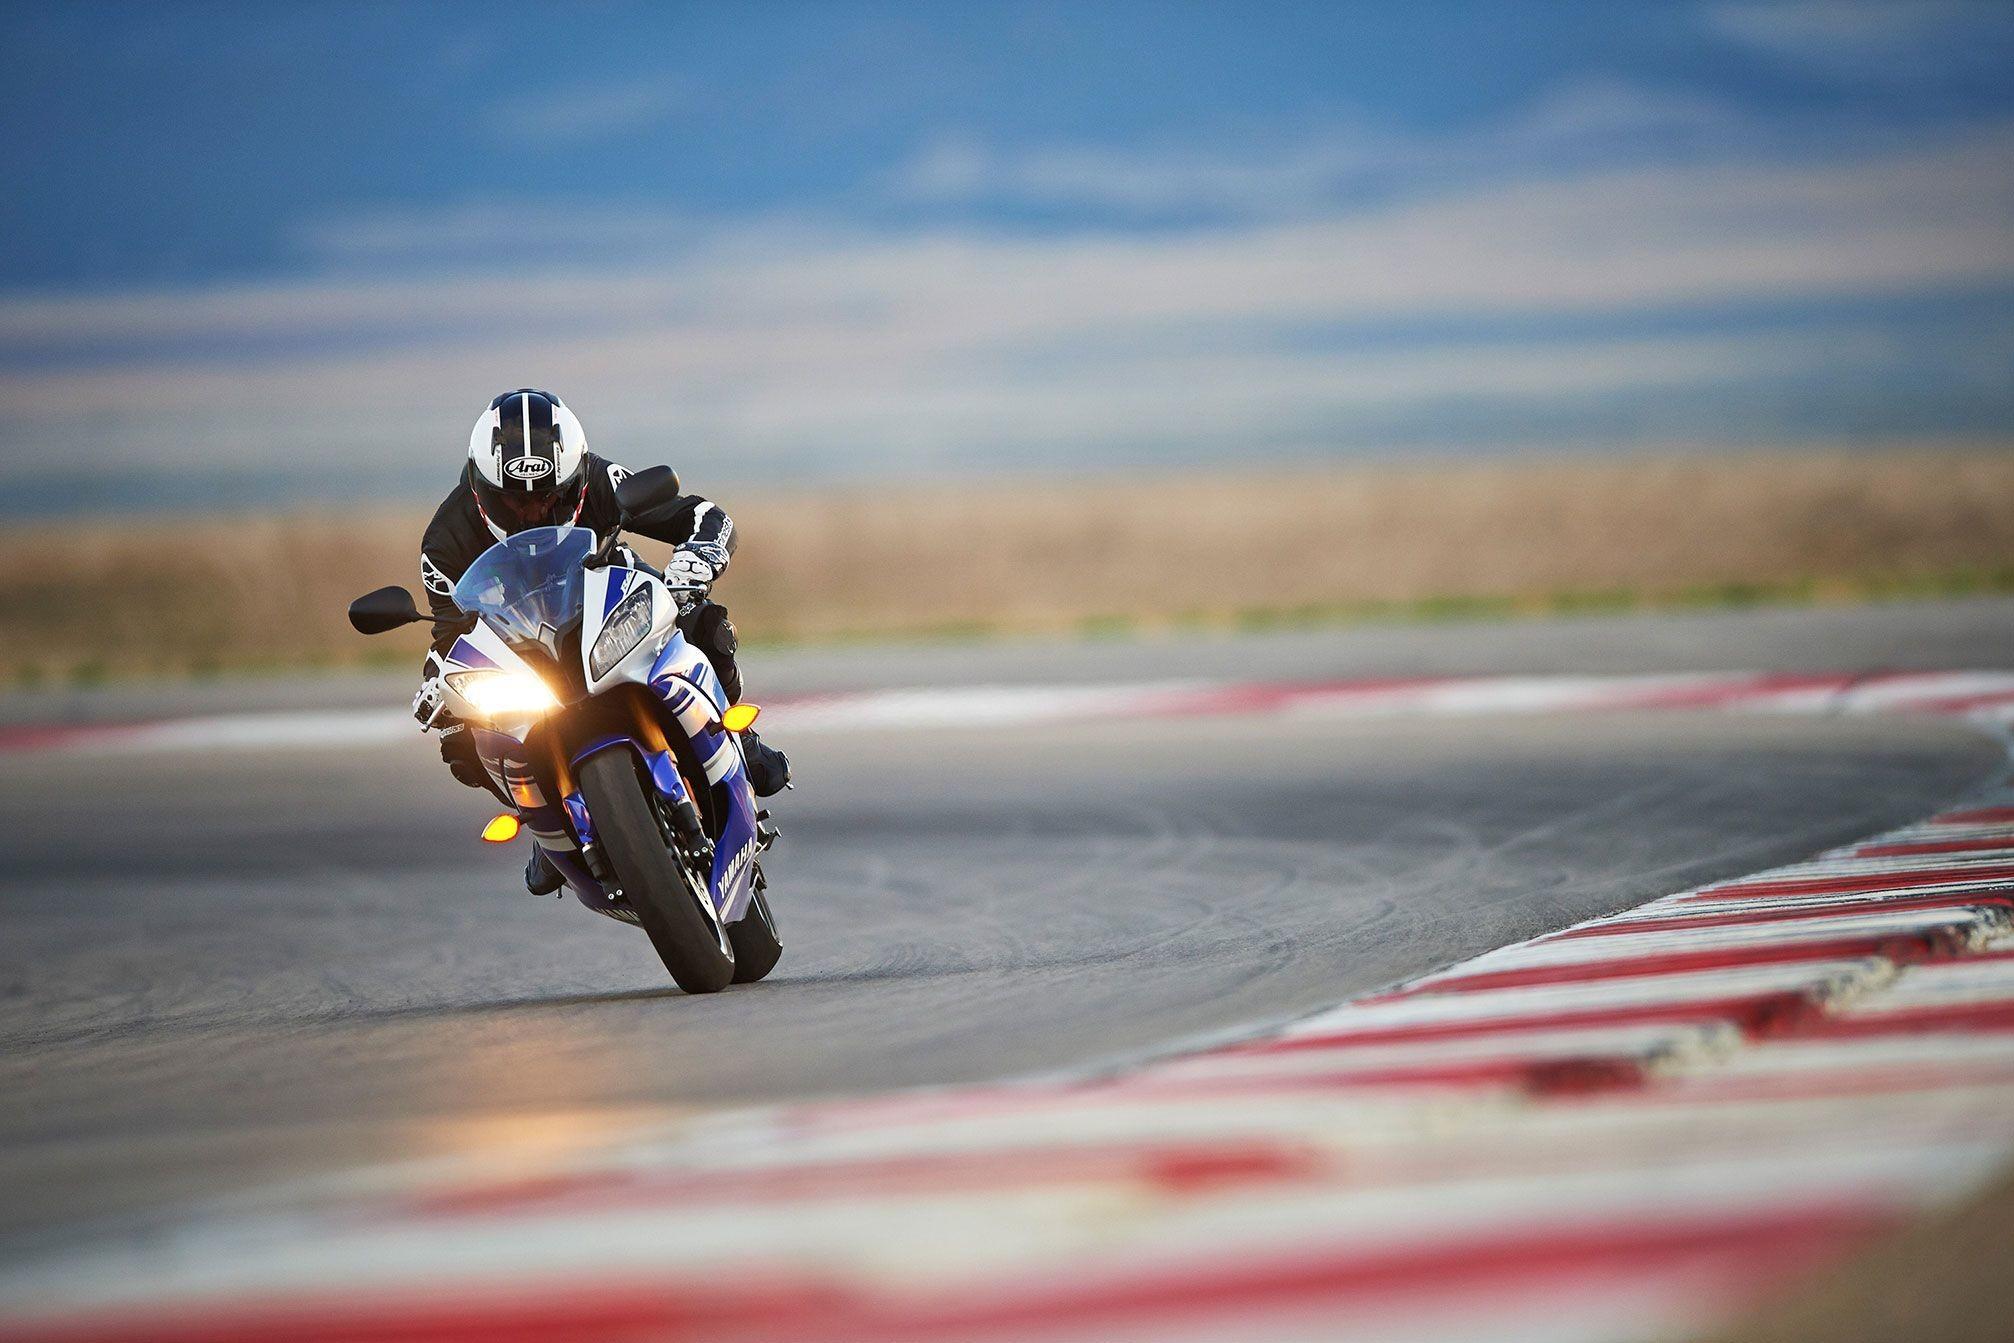 Yamaha R6 Bike Wallpapers | Download Wallpaper | Pinterest | Yamaha bikes,  Wallpaper free download and Wallpaper